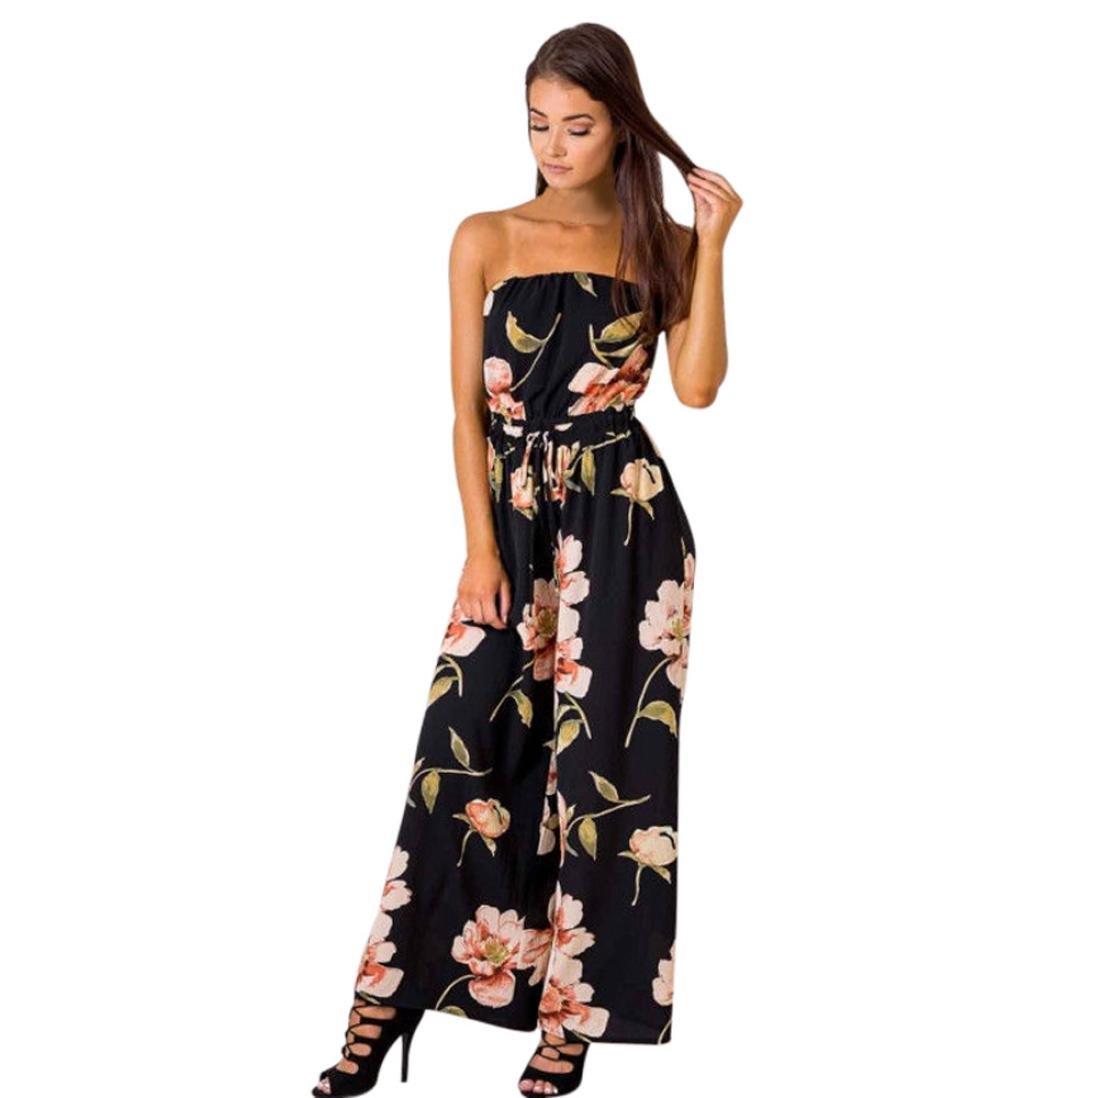 Ninasill Hot Sale ! Women Playsuit, Exclusive Jumpsuit Romper Floral Regular (S, Black) z951003c